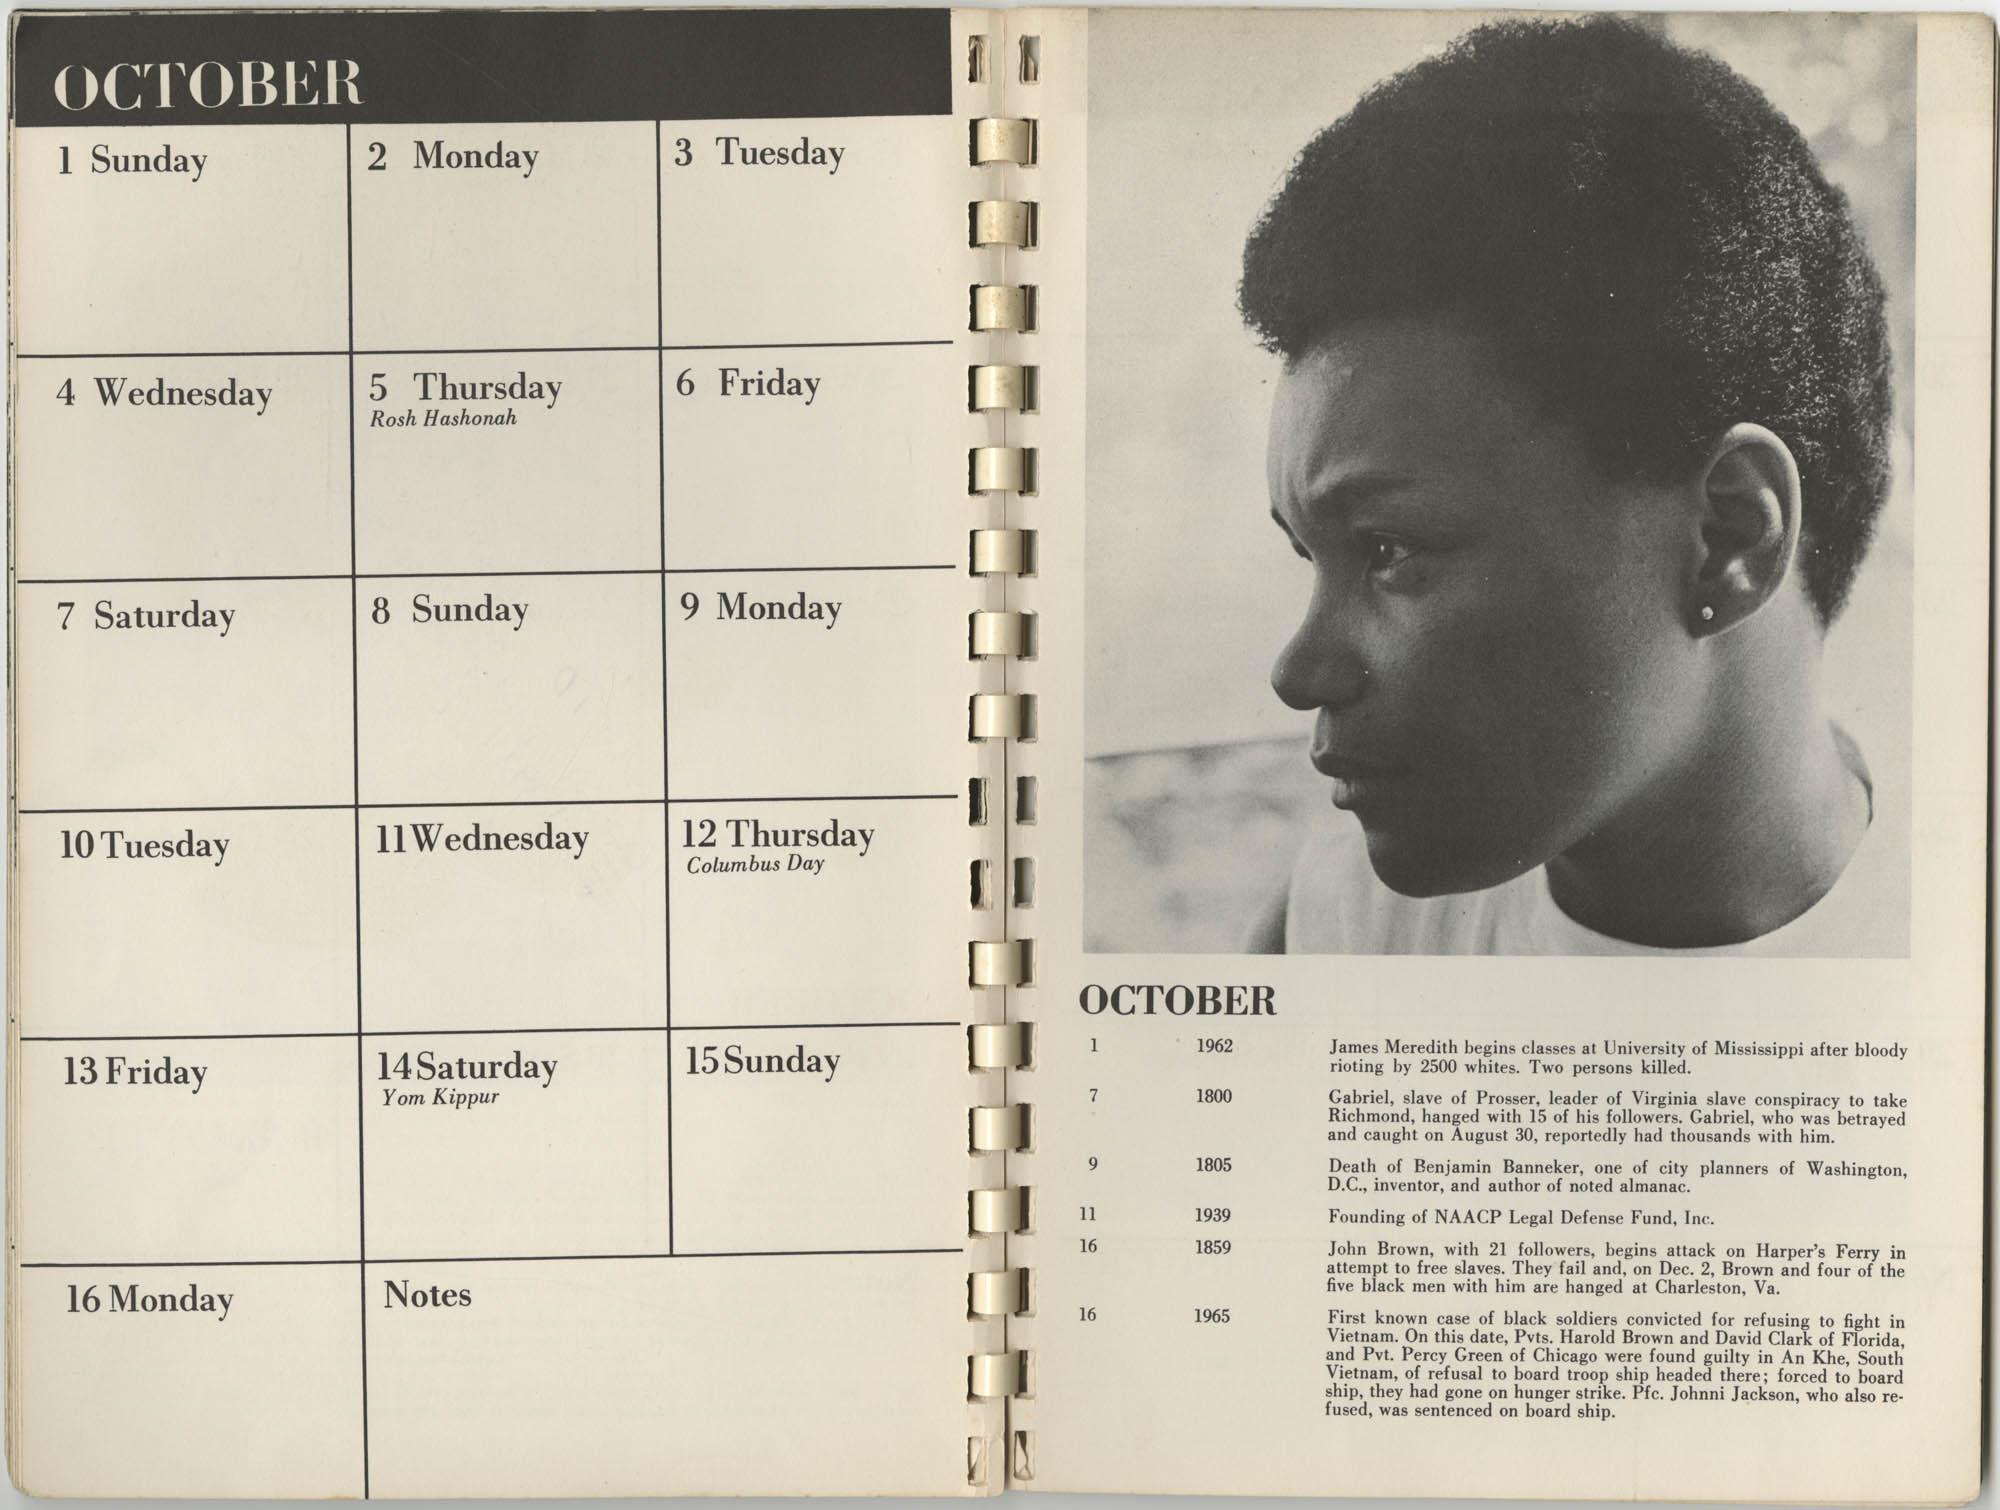 1967 SNCC Calendar, October 1-16